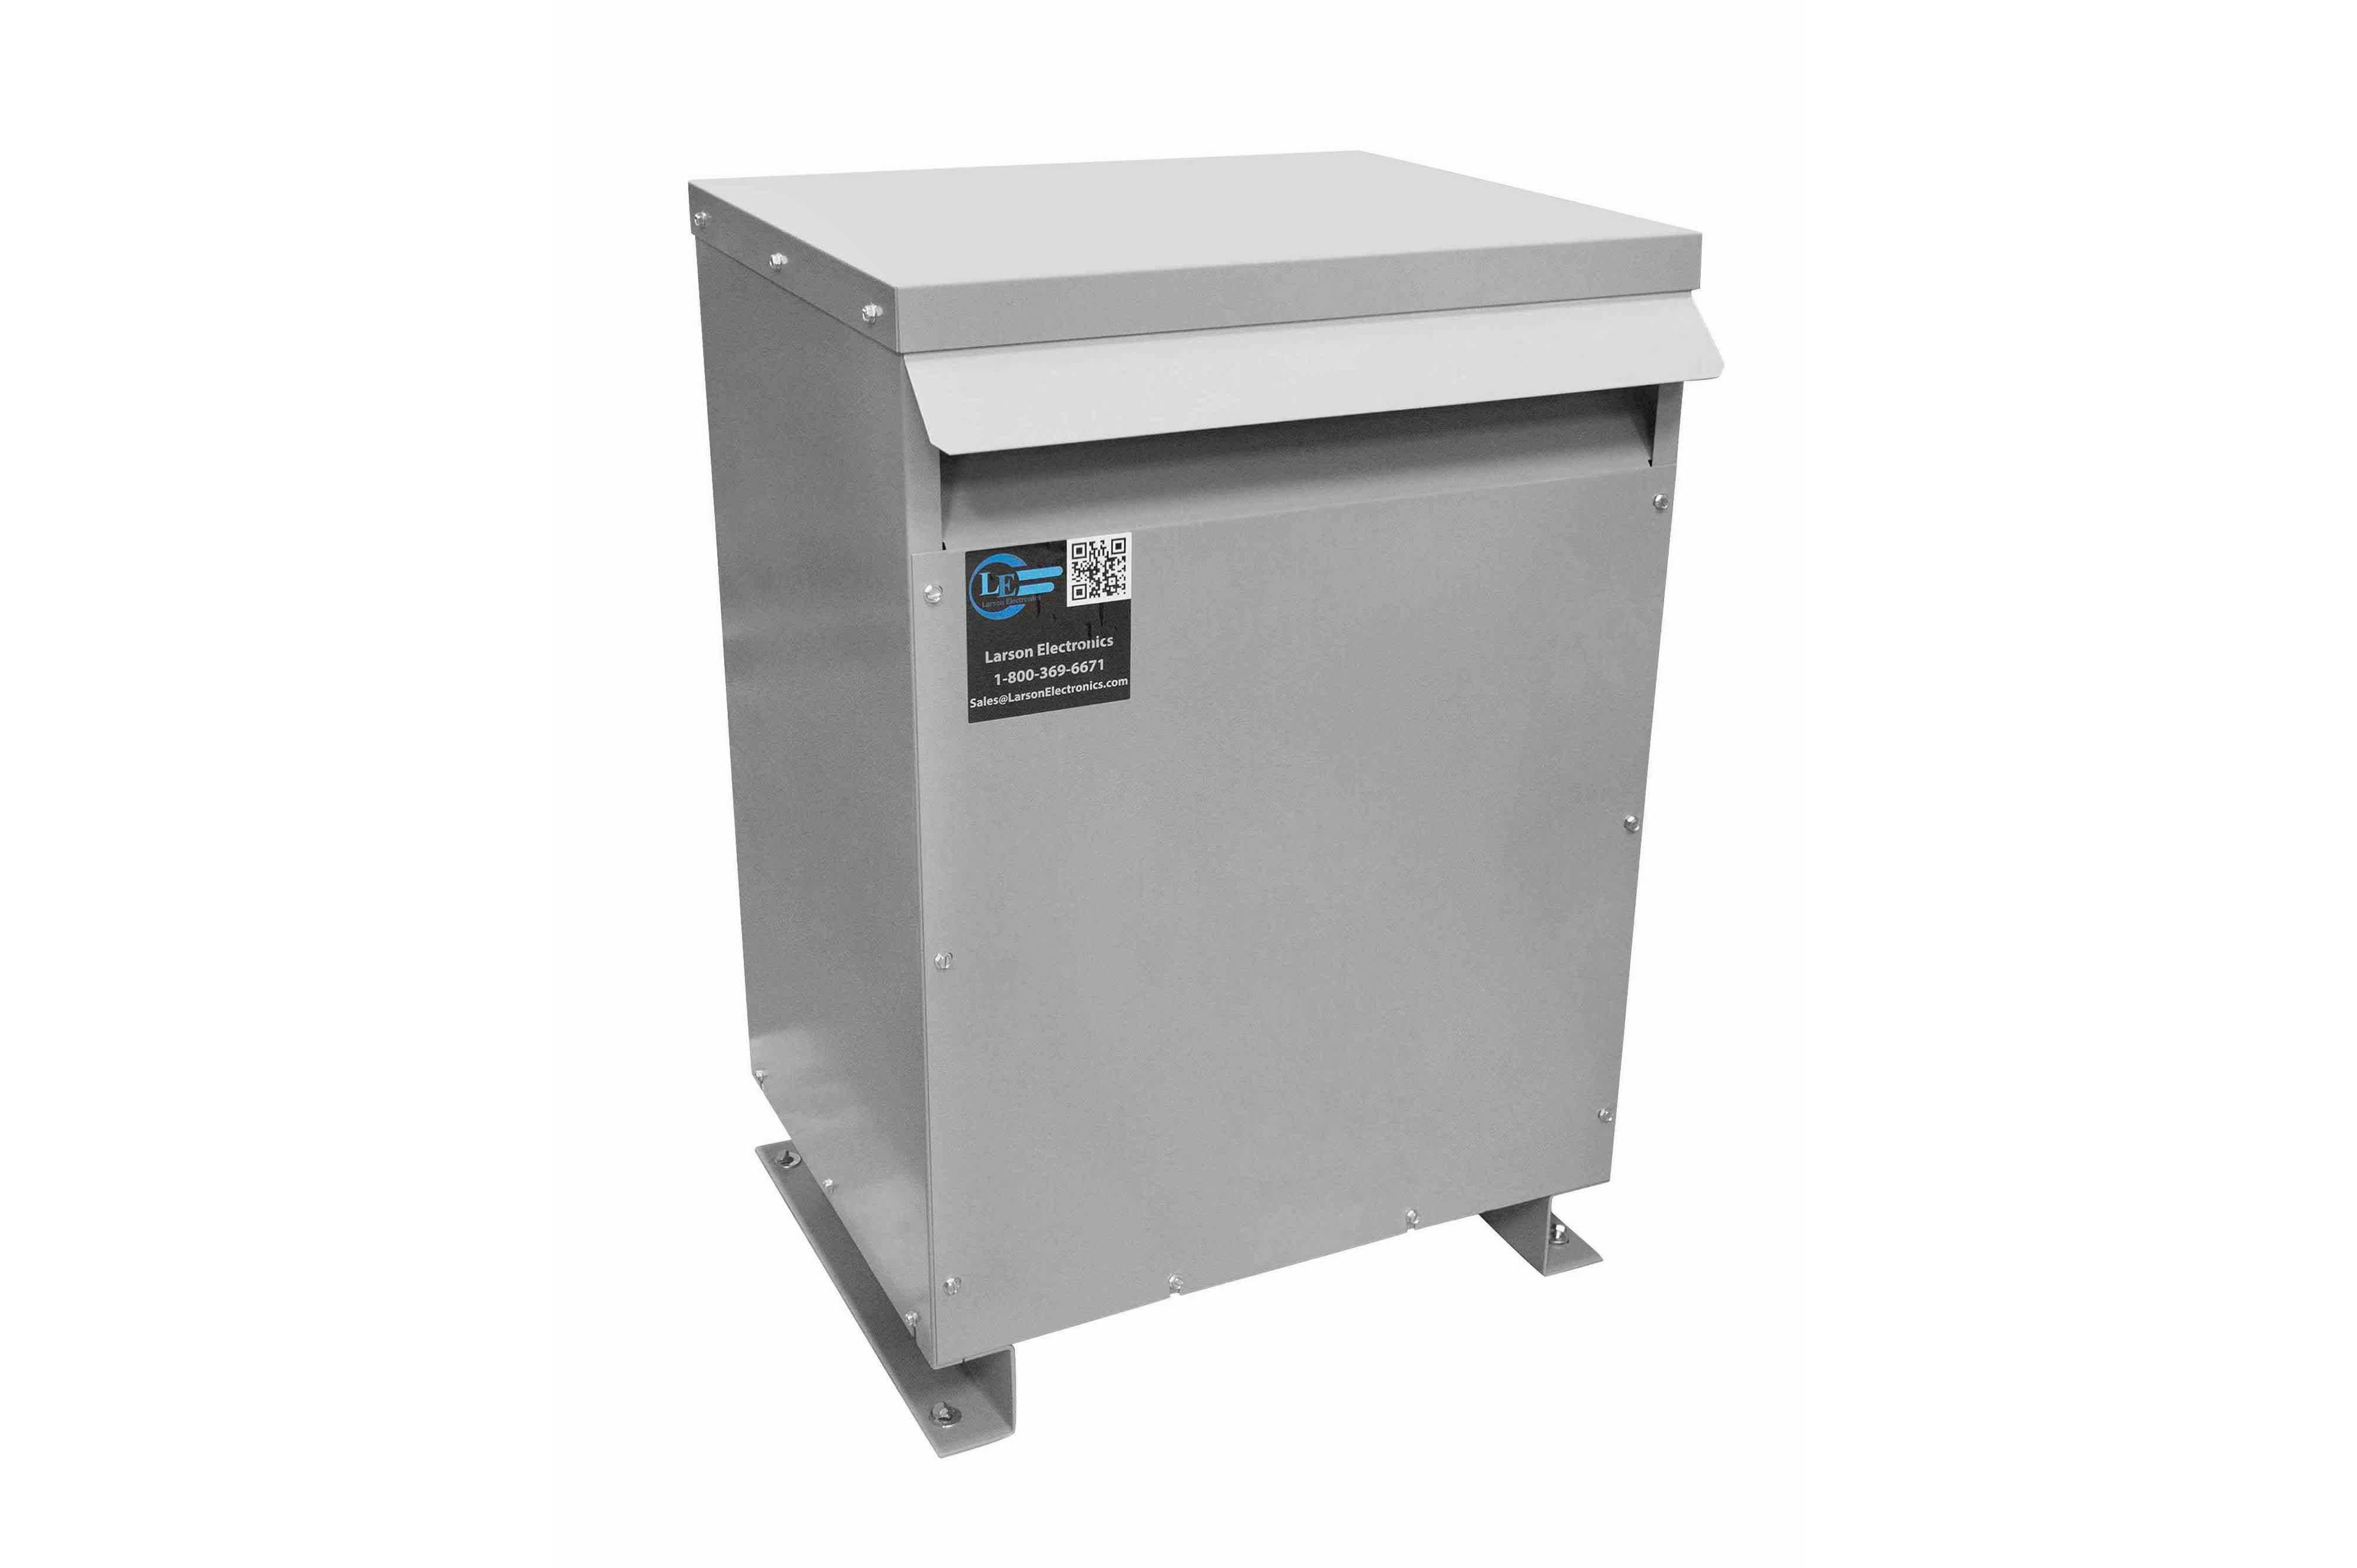 800 kVA 3PH Isolation Transformer, 208V Wye Primary, 480Y/277 Wye-N Secondary, N3R, Ventilated, 60 Hz